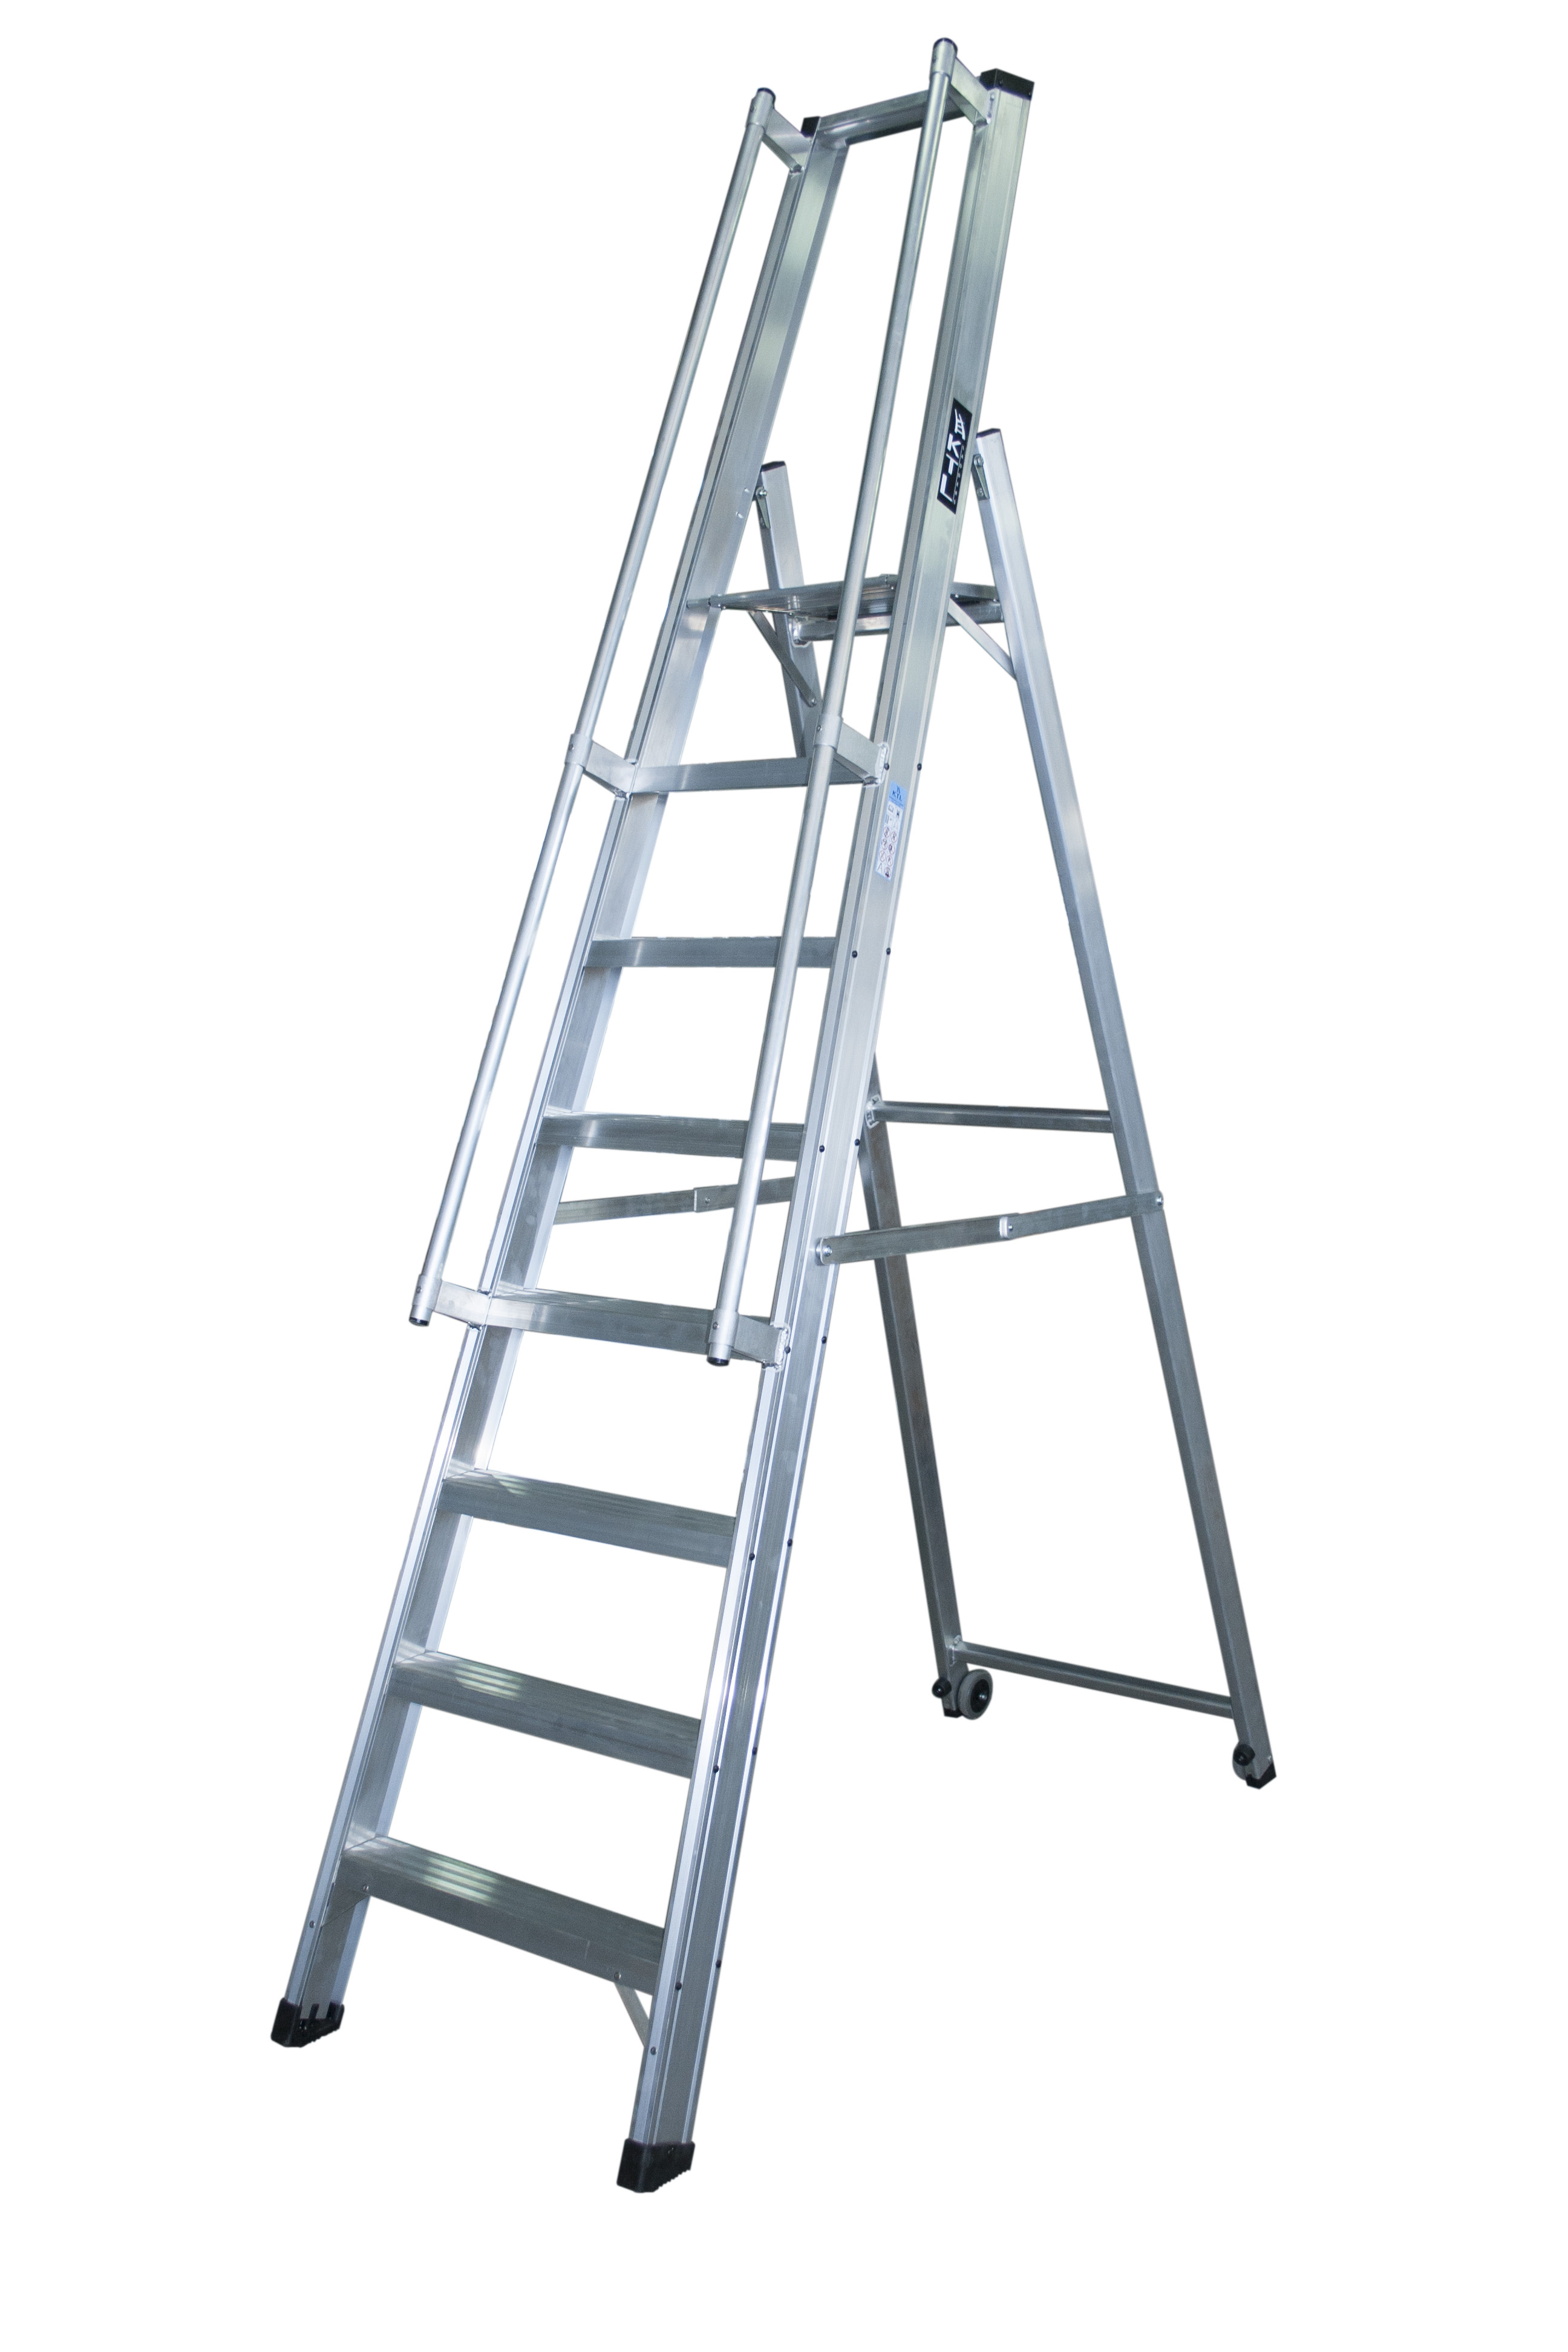 escalera de tijera xl-s Escalera de tijera XL-S xl s 8